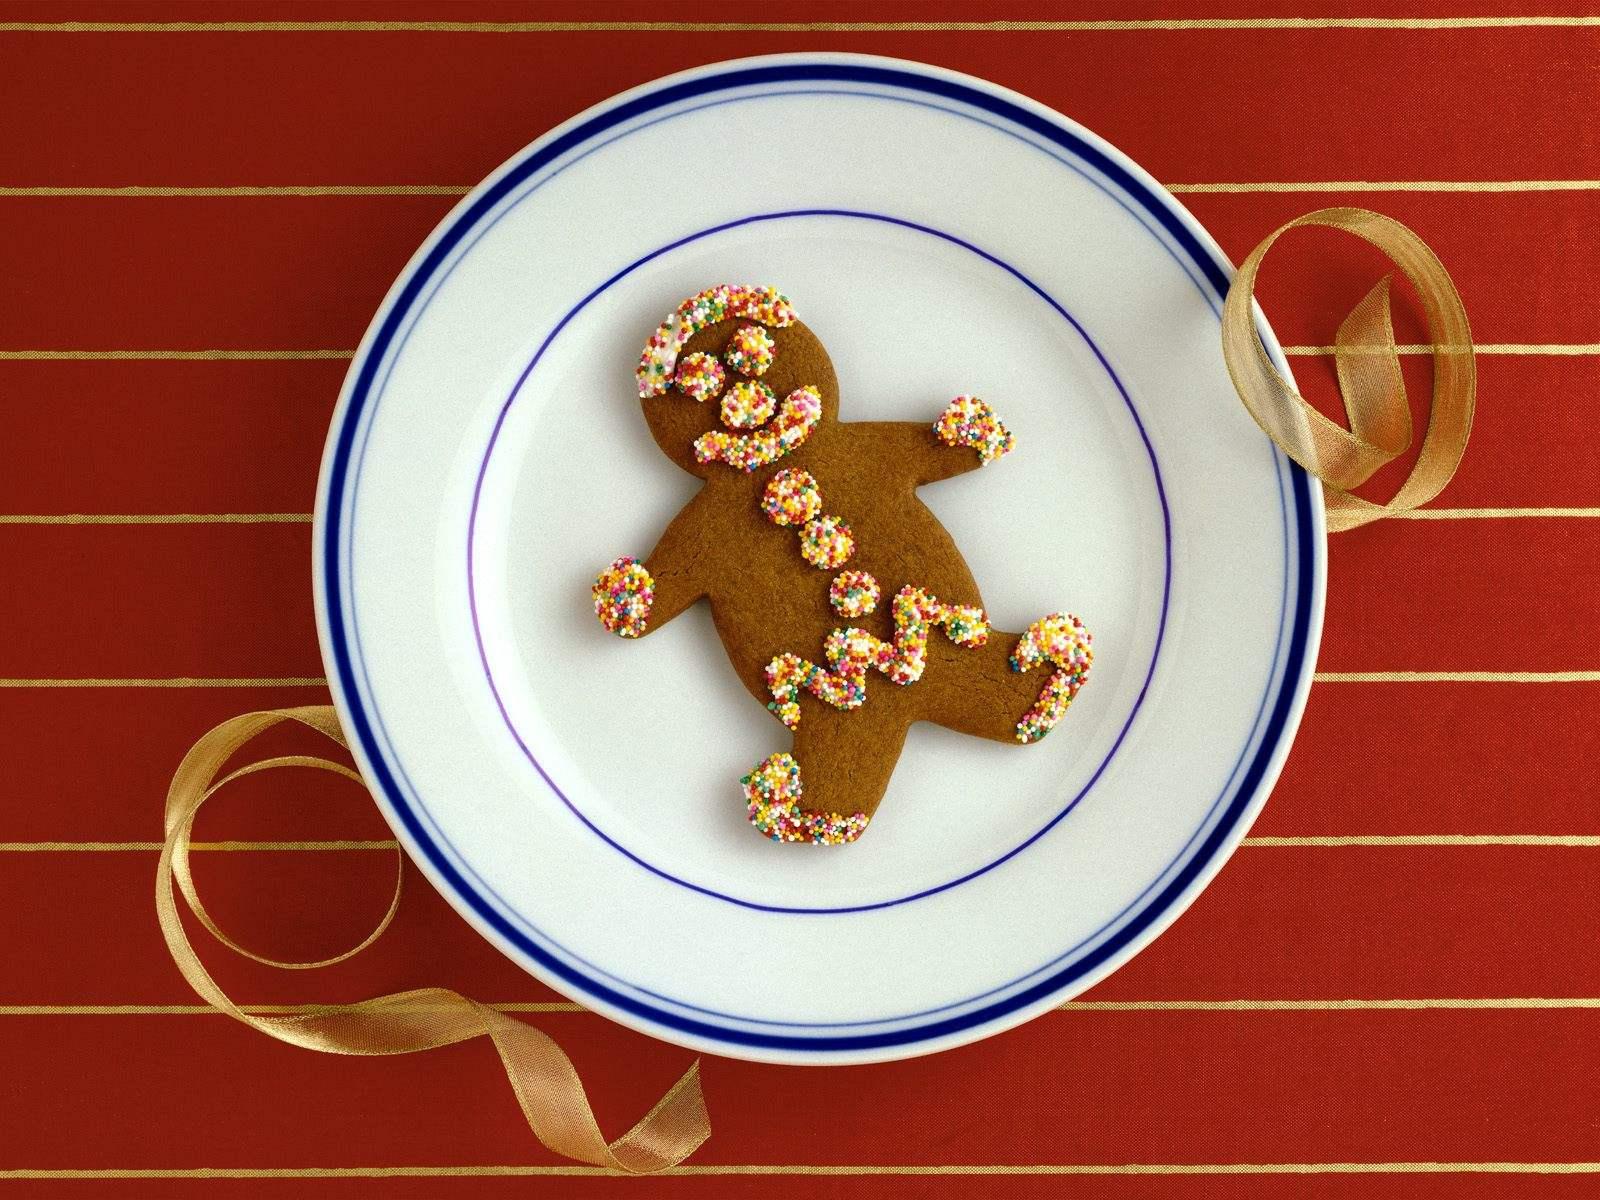 Gingerbread Man Wallpapers - Wallpaper - 263.8KB